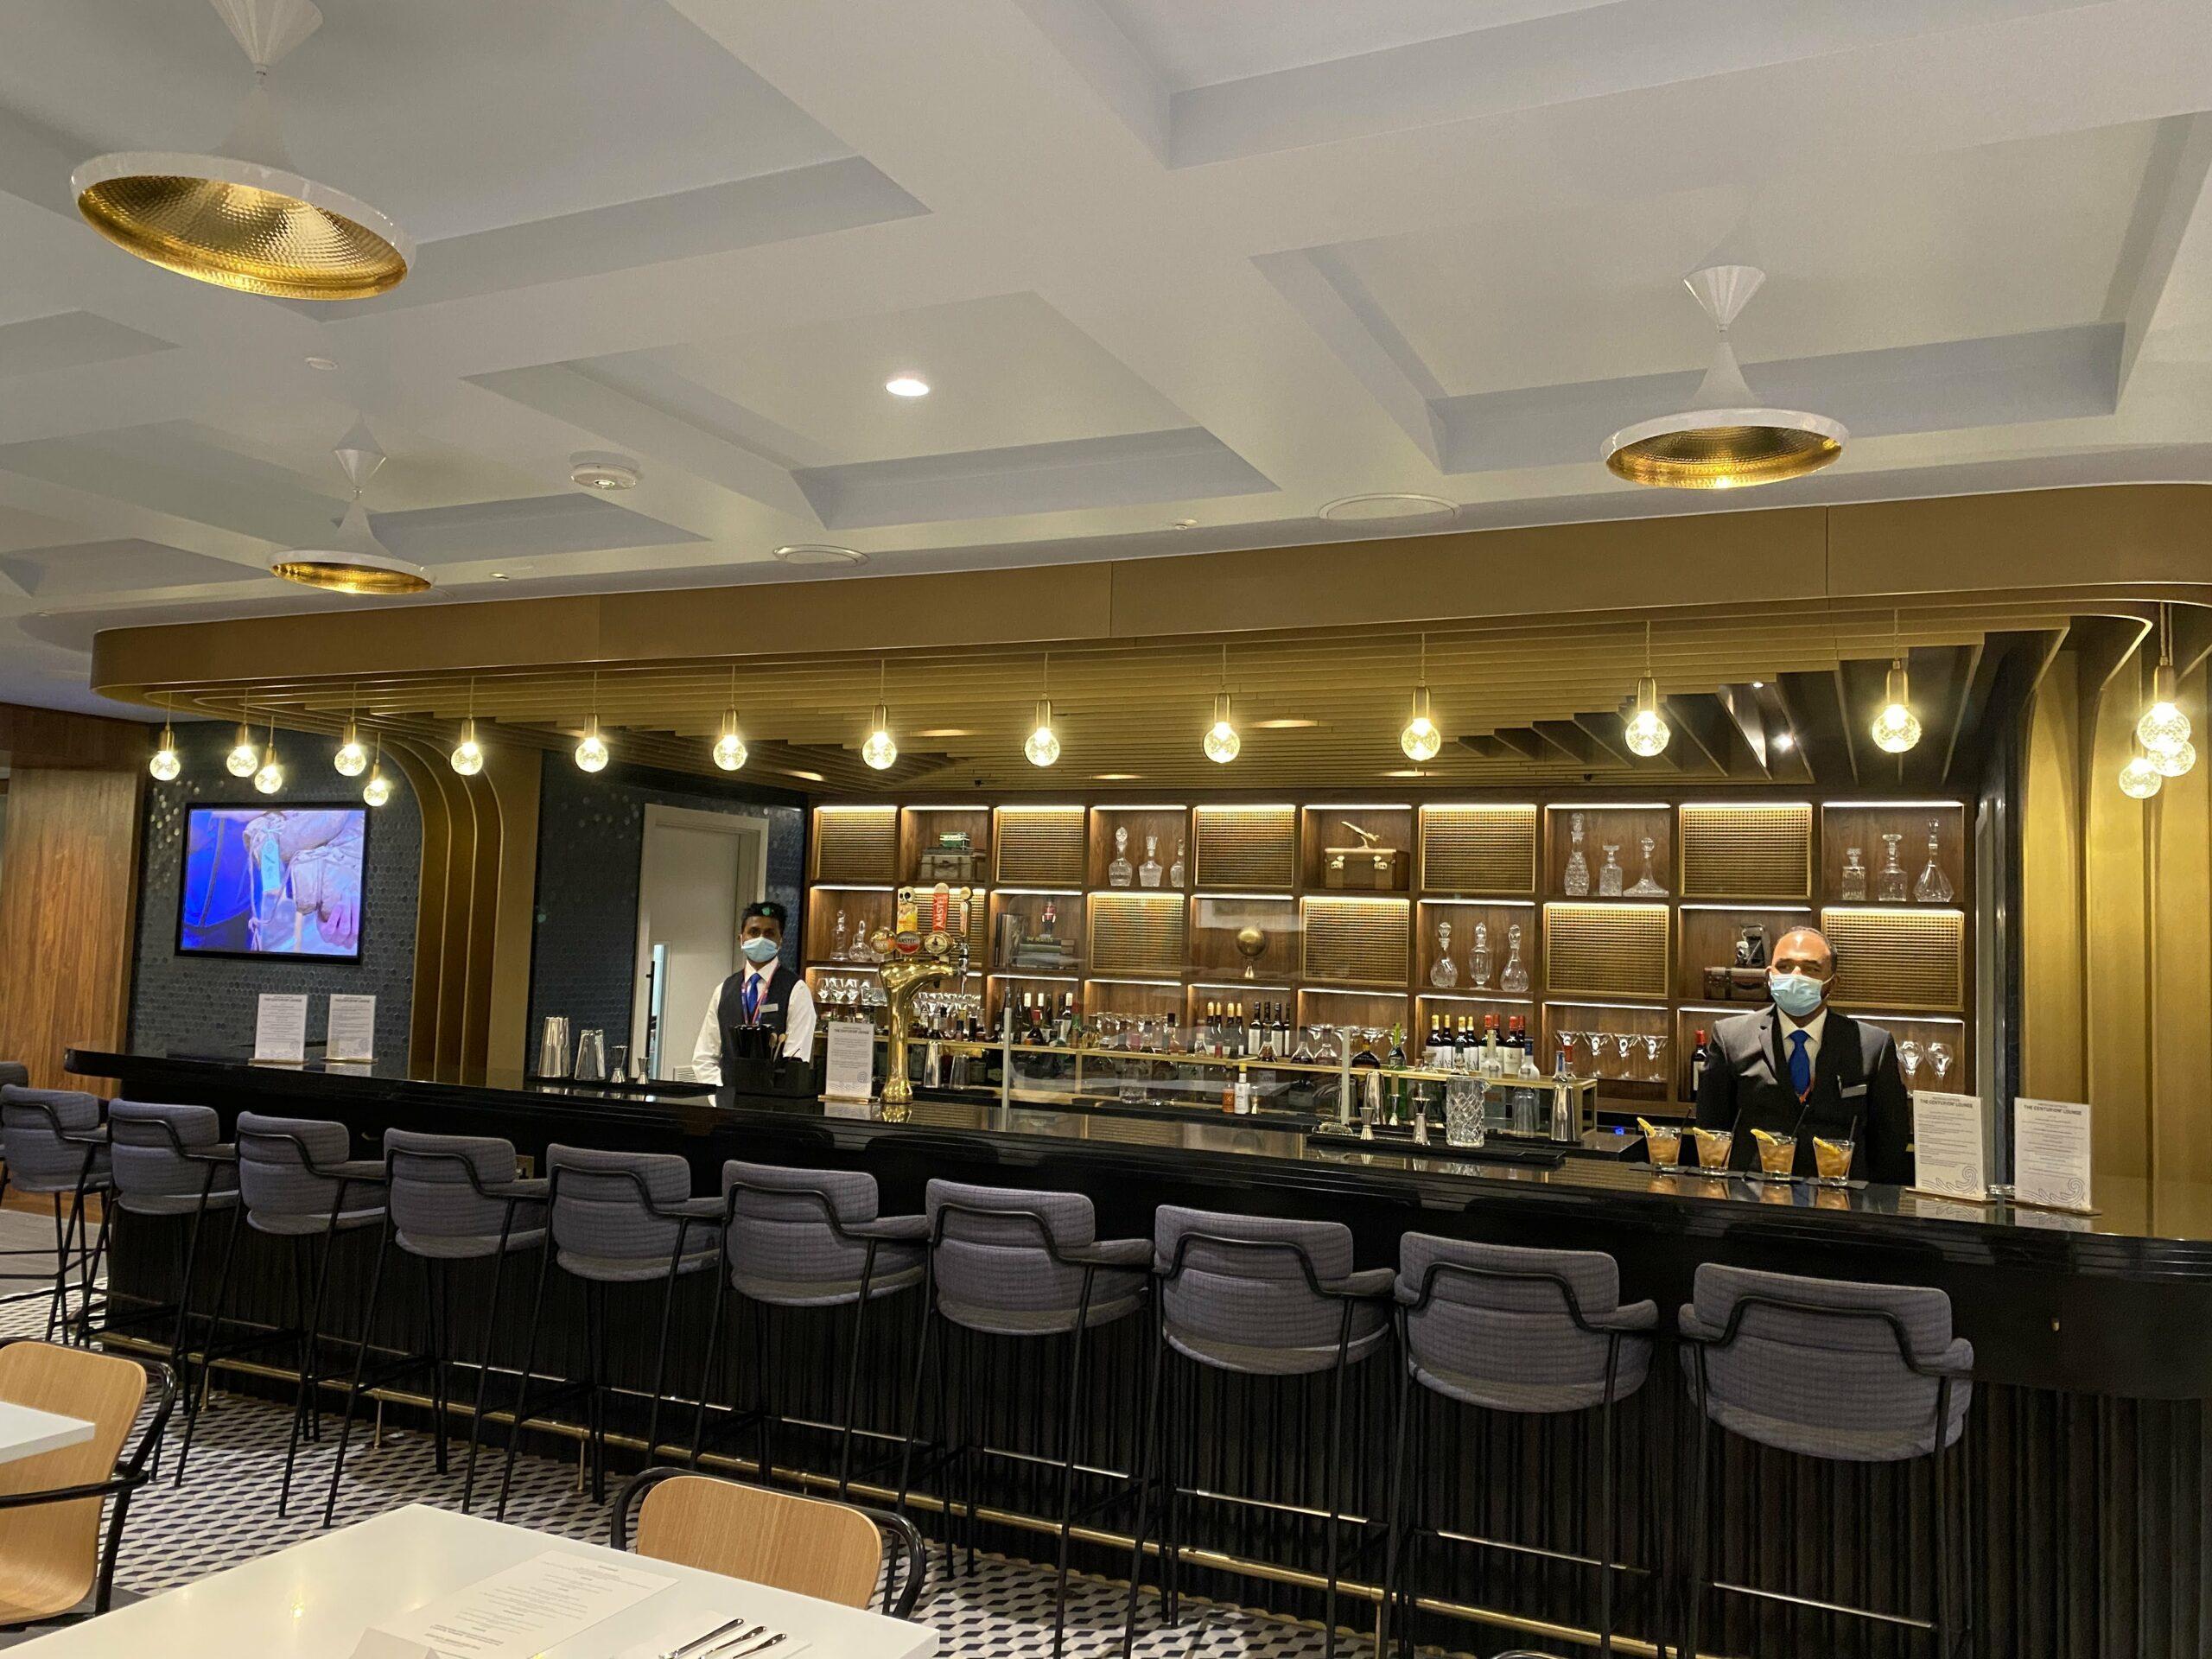 American Express New Centurion Lounge at London Heathrow T3 bar